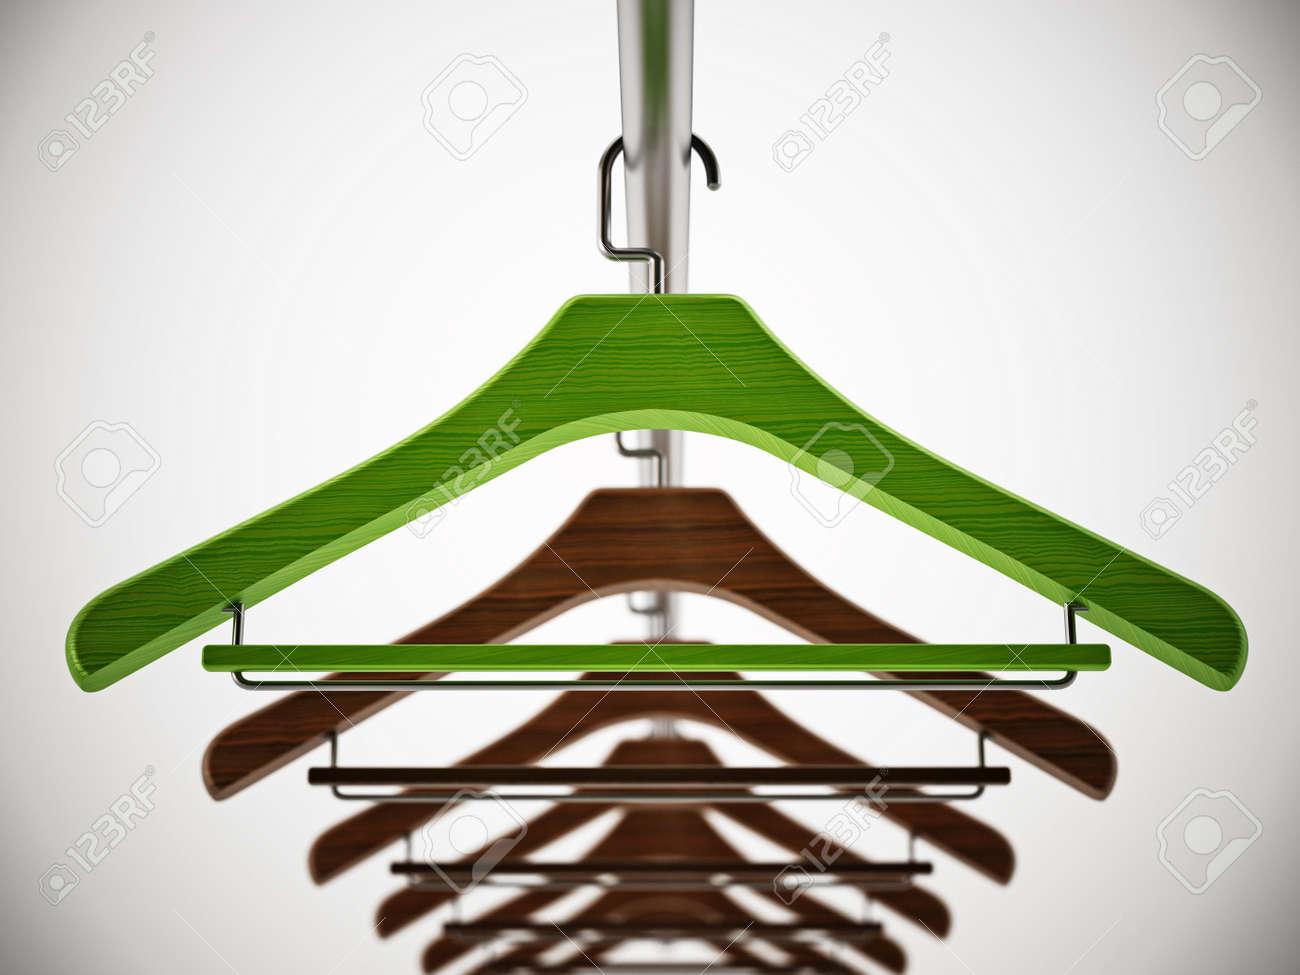 Green clothes-hanger stands out among regular hangers. 3D illustration. - 172256729